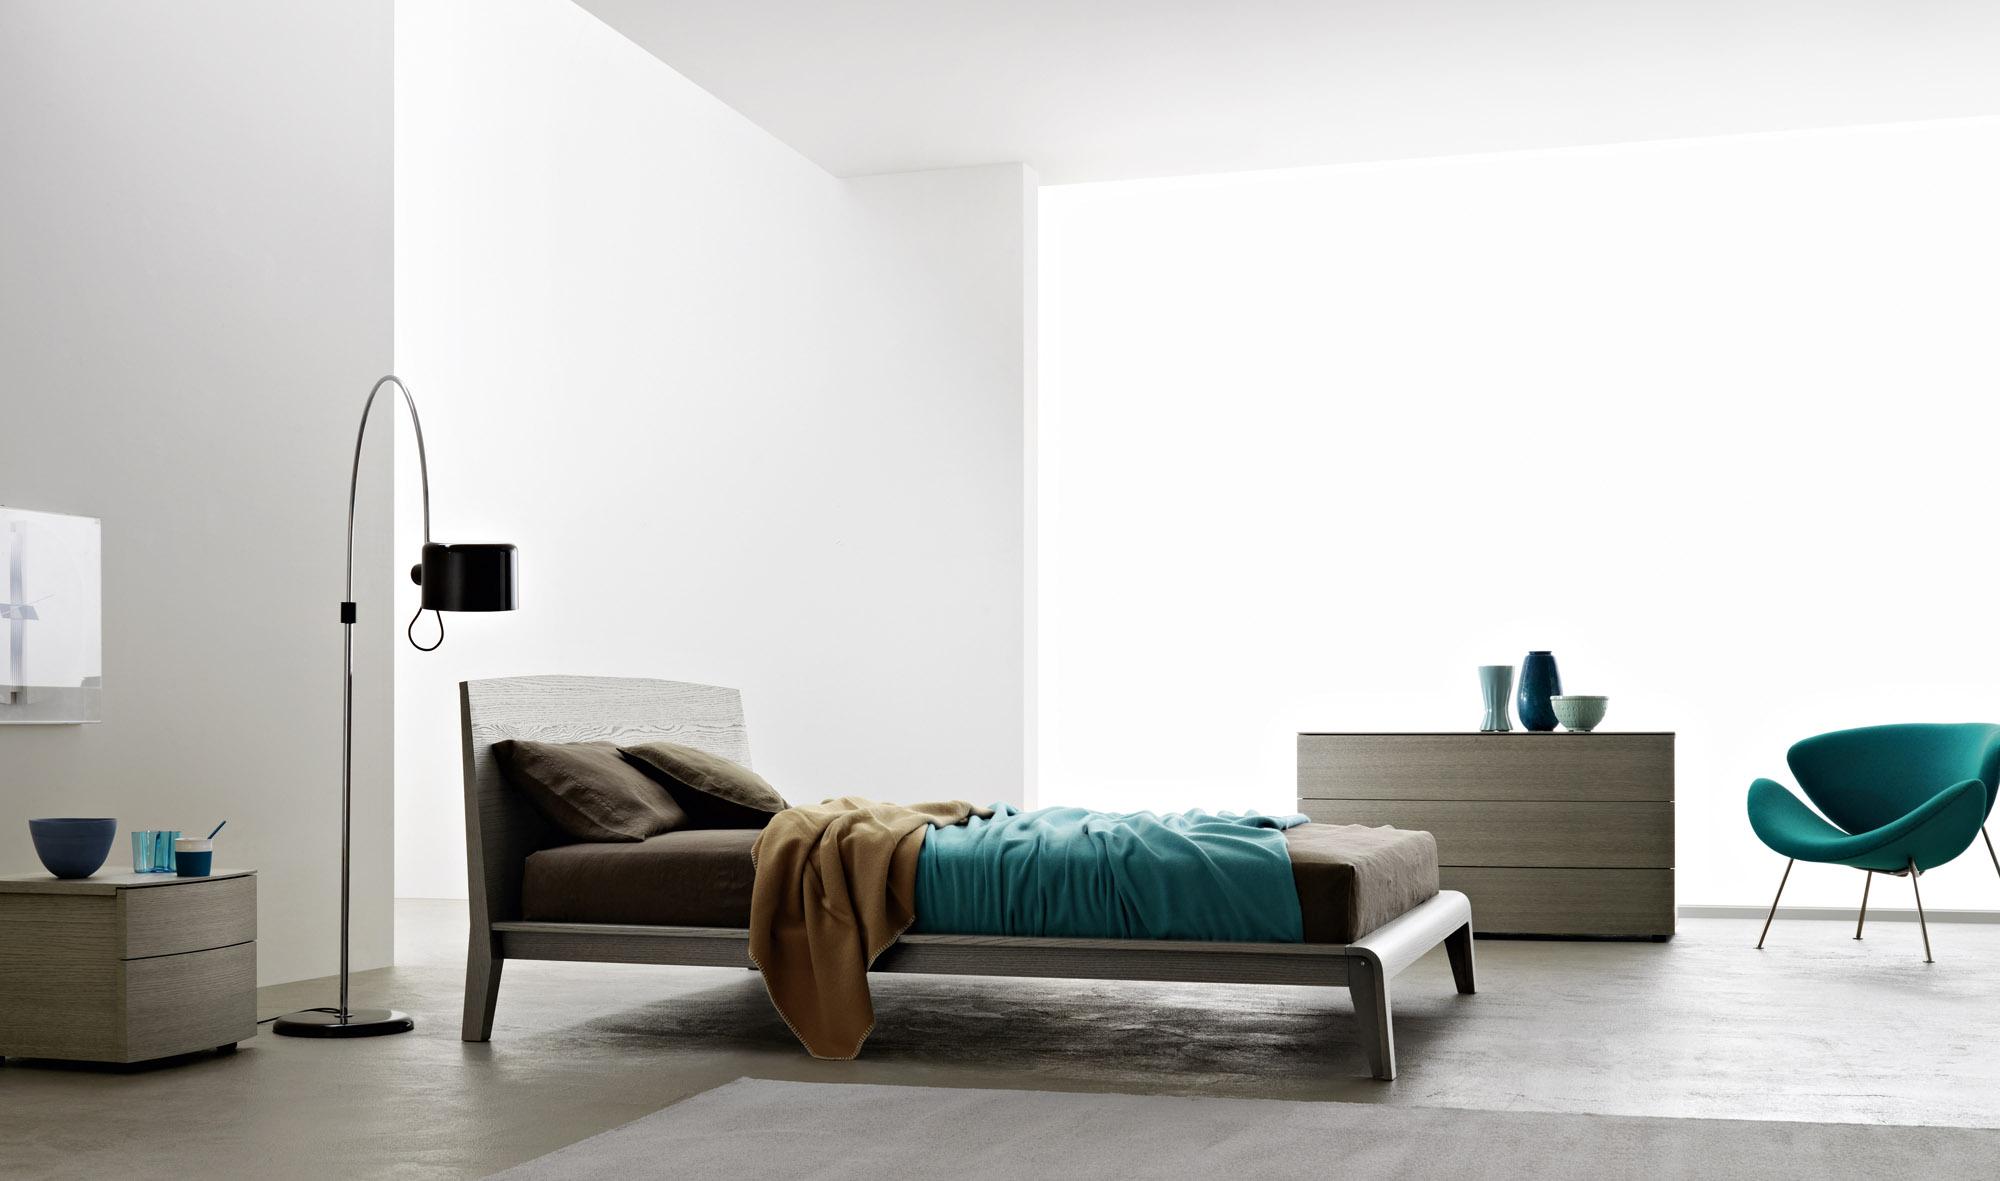 IL Decor Boston: Cloe Wooden Bed by Sangiacomo, Italy